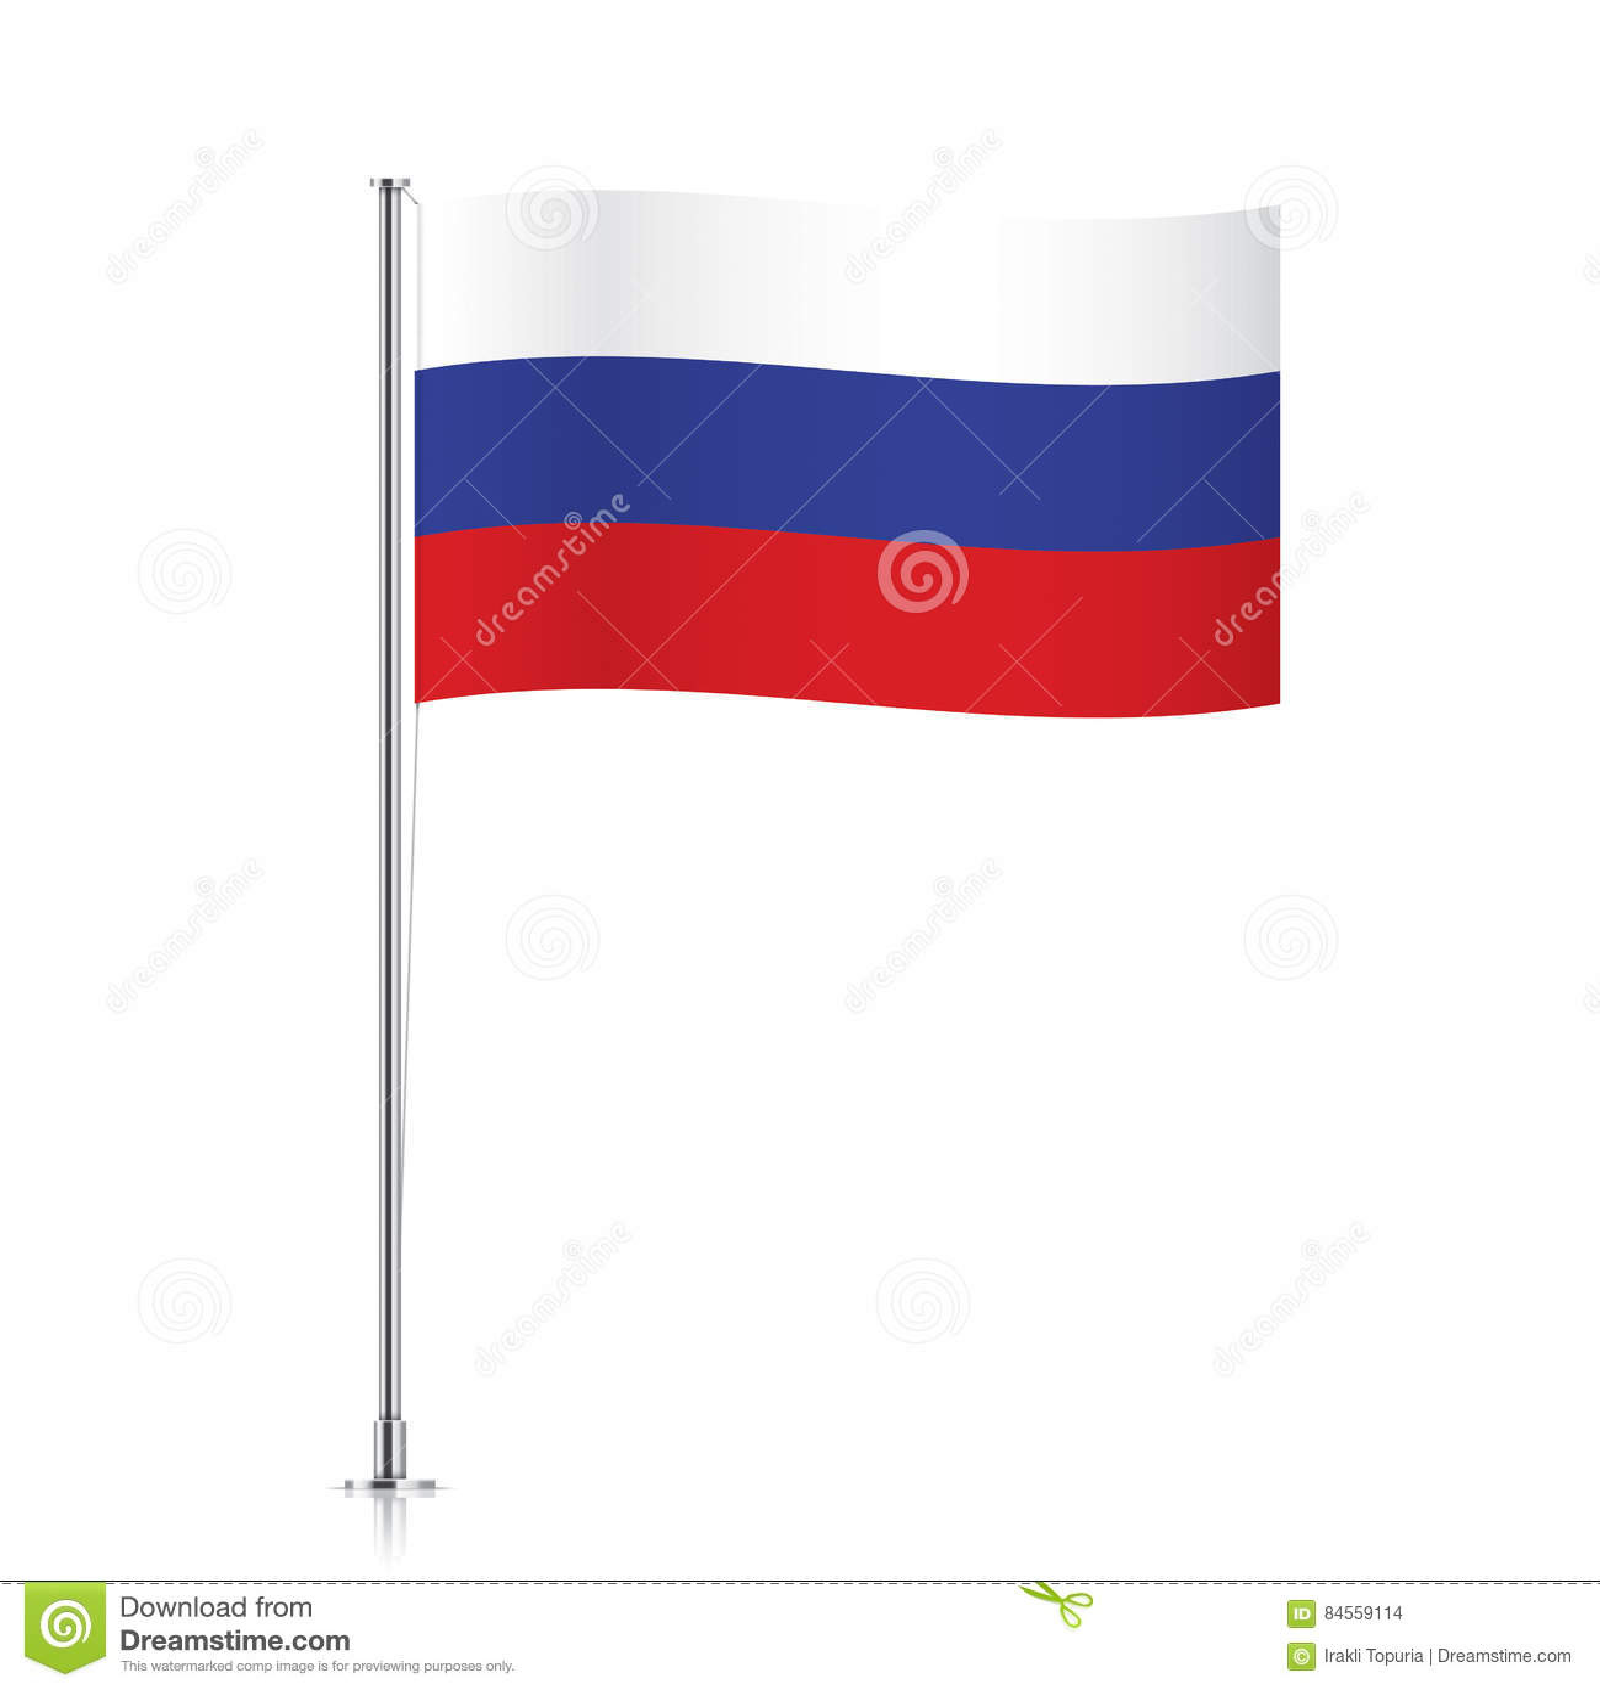 Flag Of Russia Waving On A Metallic Pole Stock Vector